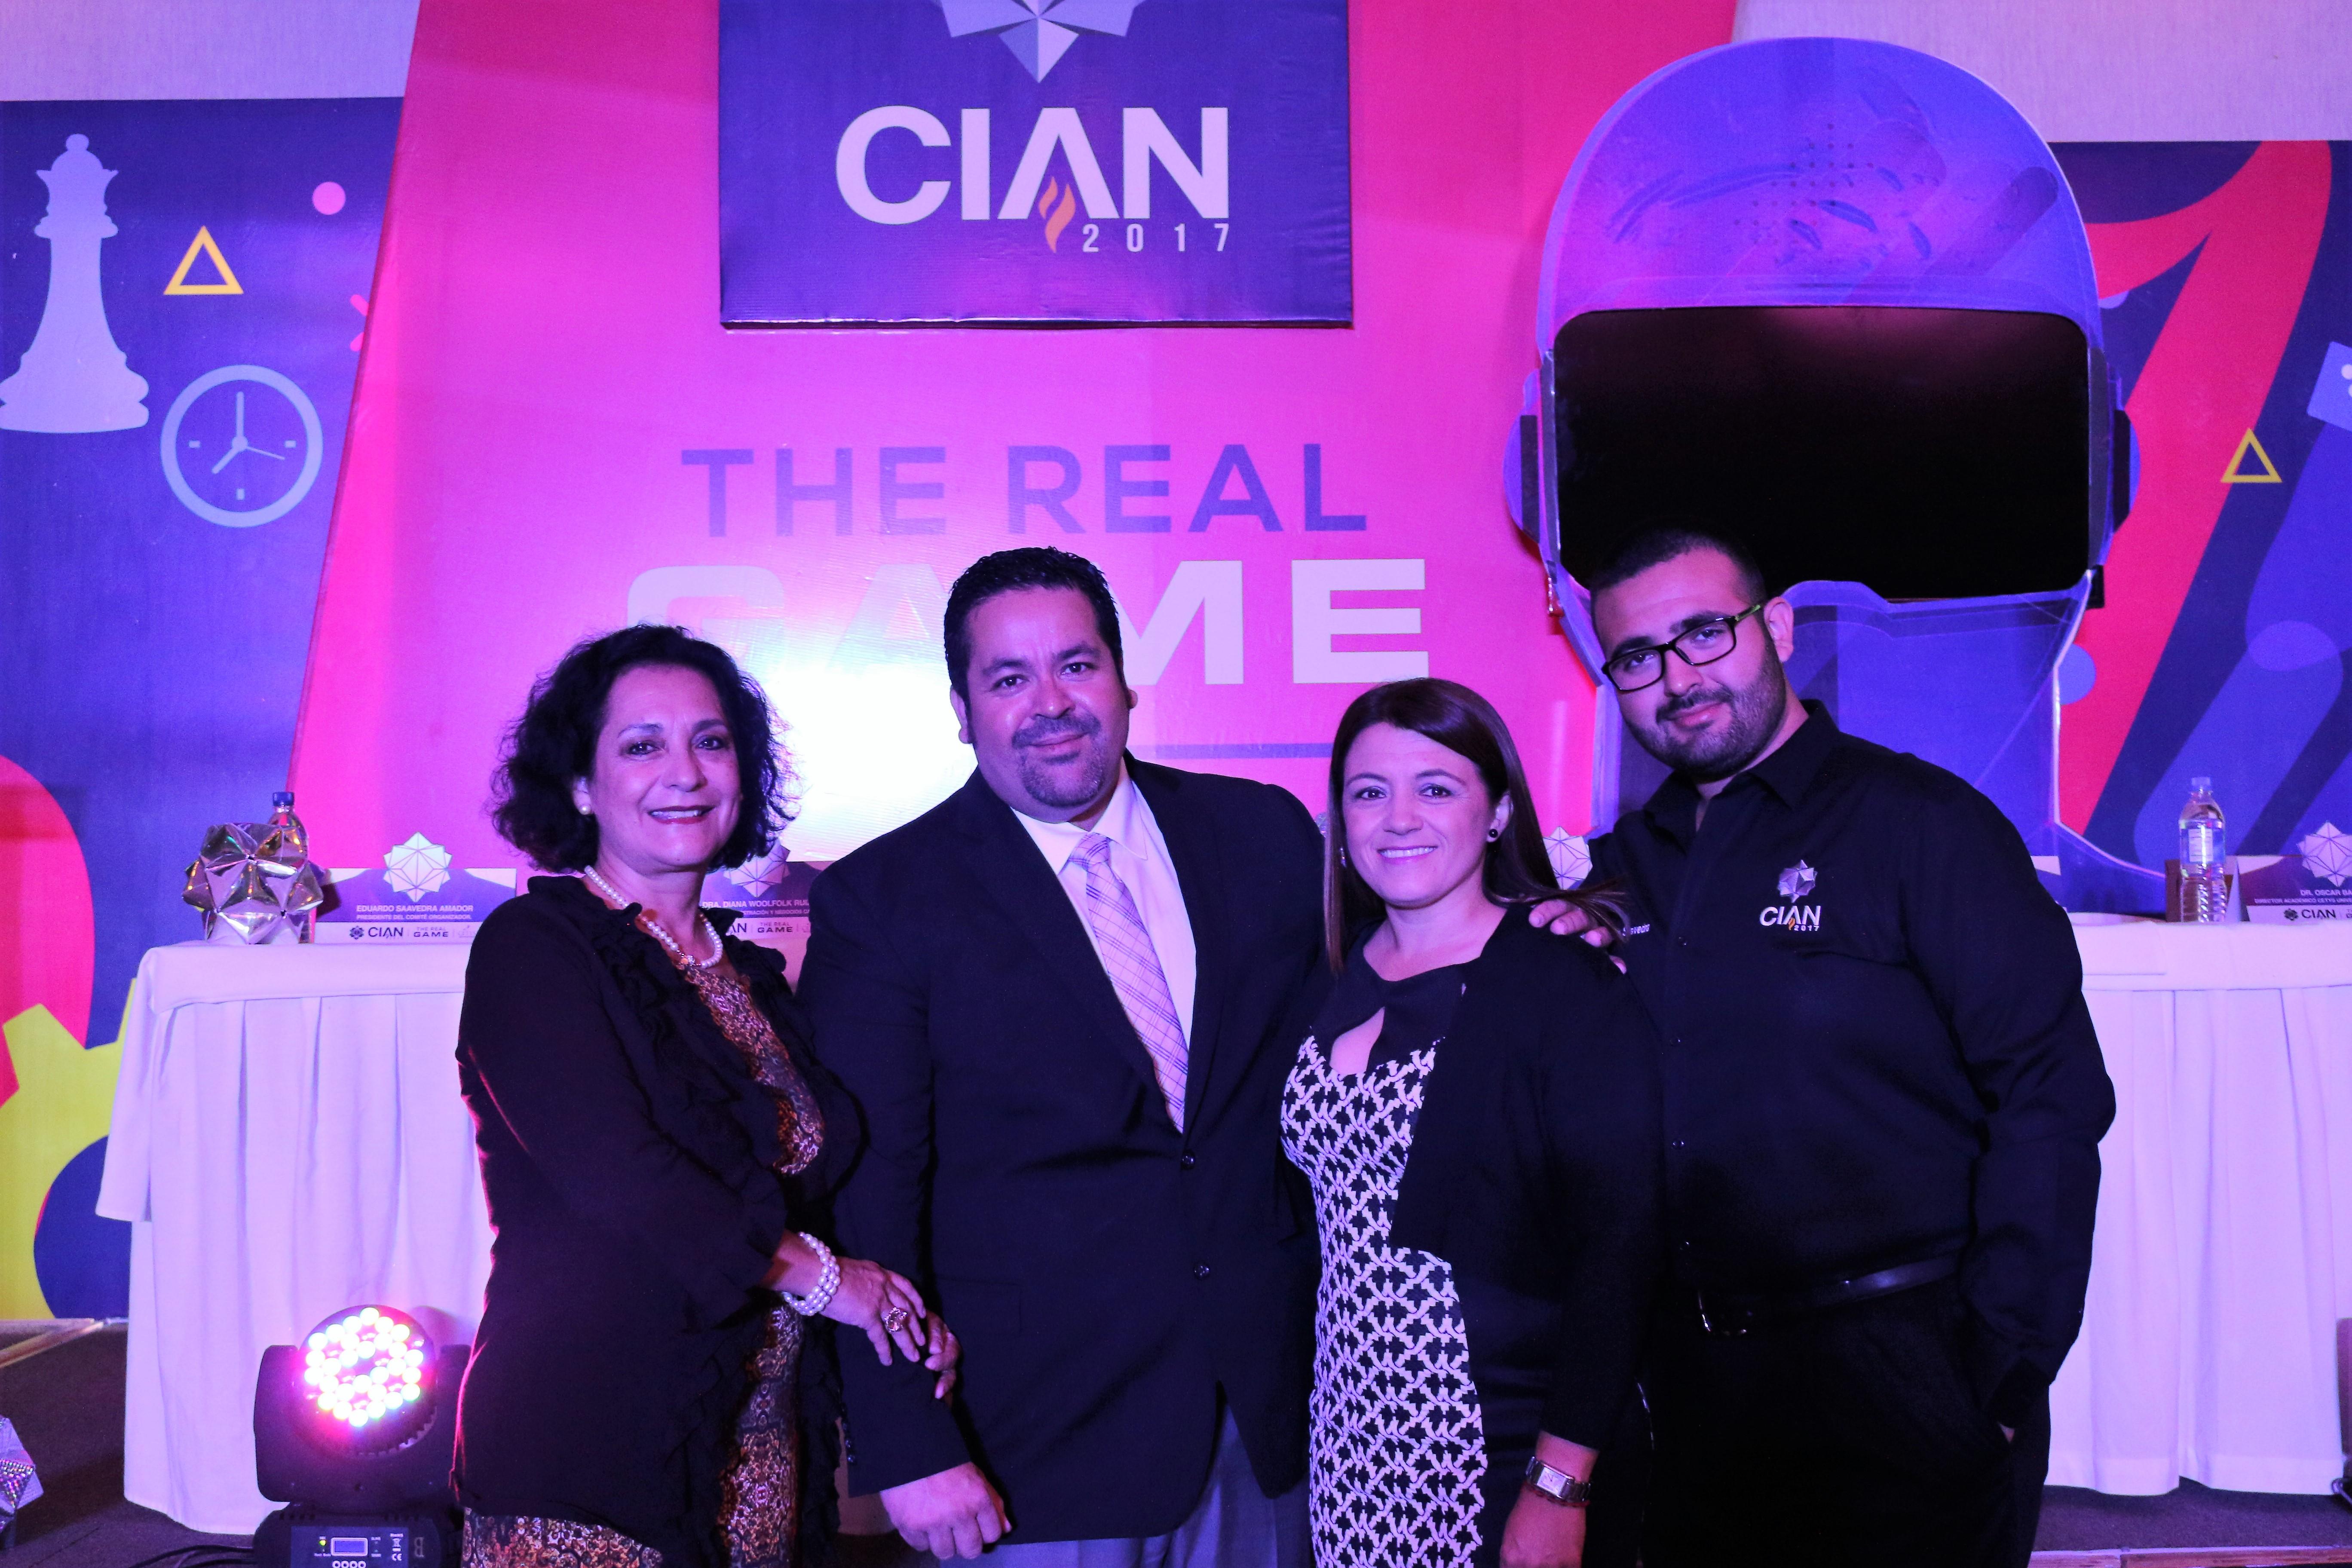 CIAN 2017